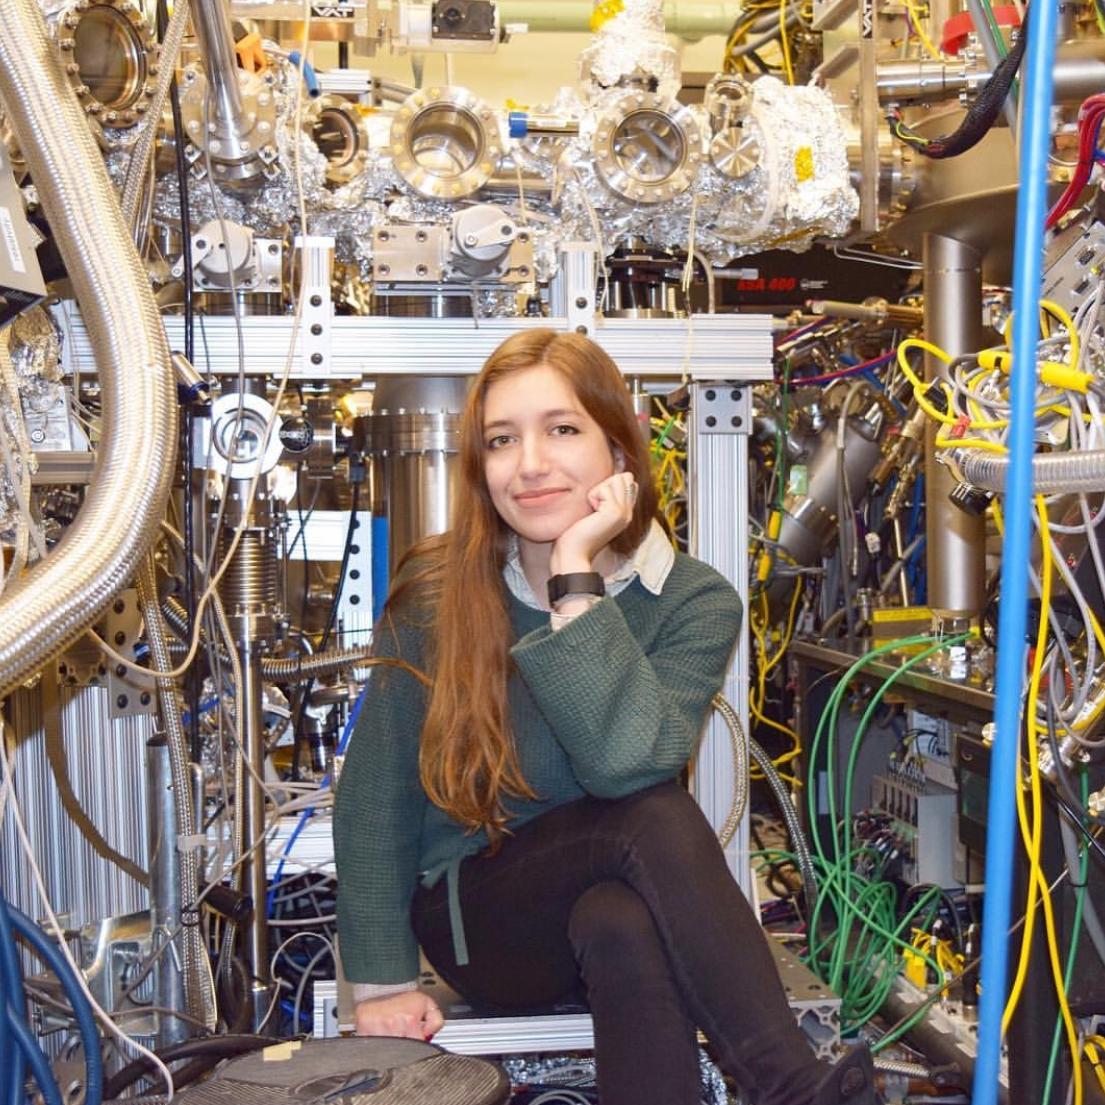 Lindsey  @the_engineeress Specialty: Engineering